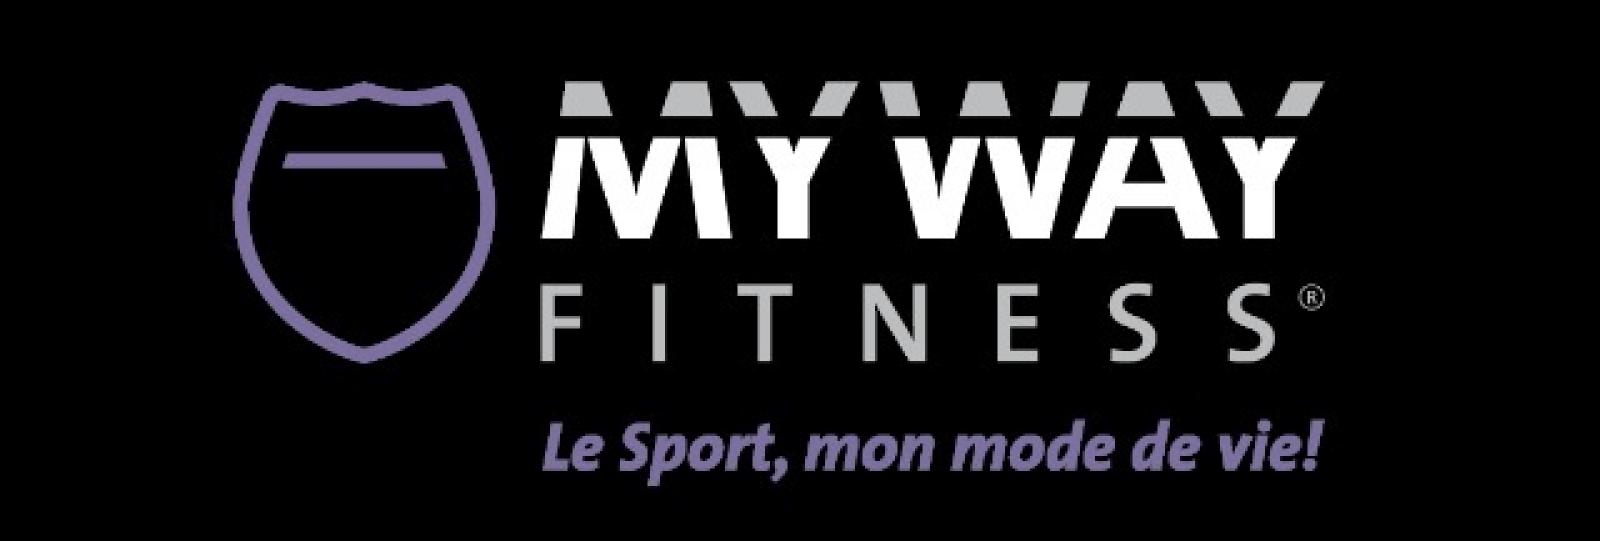 My way fitness